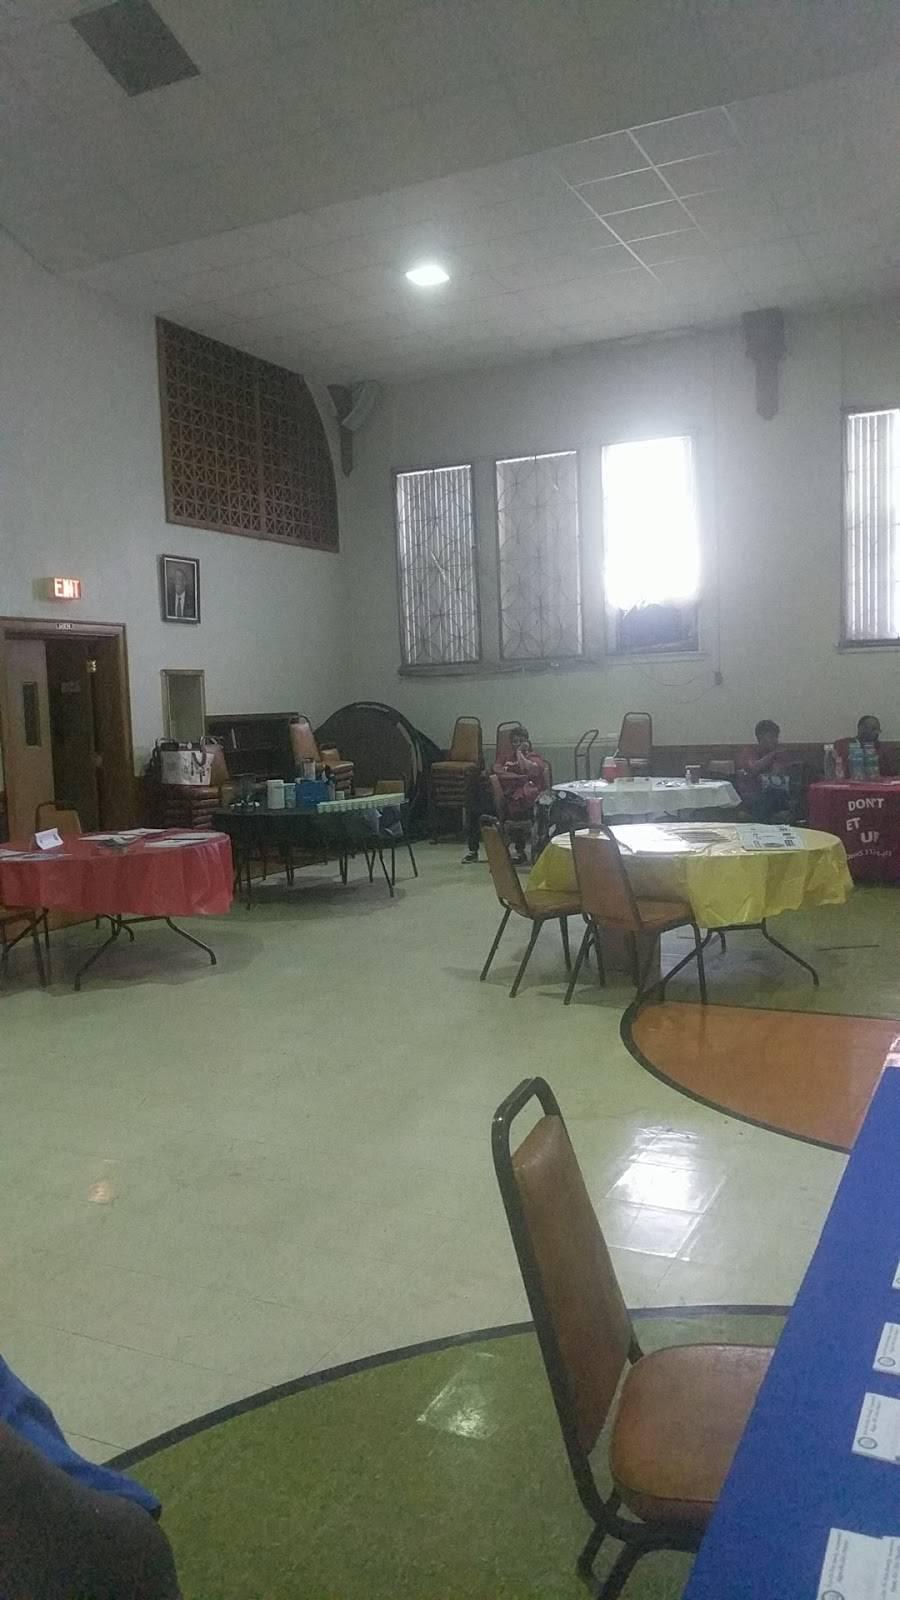 Mt Calvary Missionary Baptist Church - church  | Photo 2 of 9 | Address: 4743 Iroquois Ave, Detroit, MI 48214, USA | Phone: (313) 924-6090